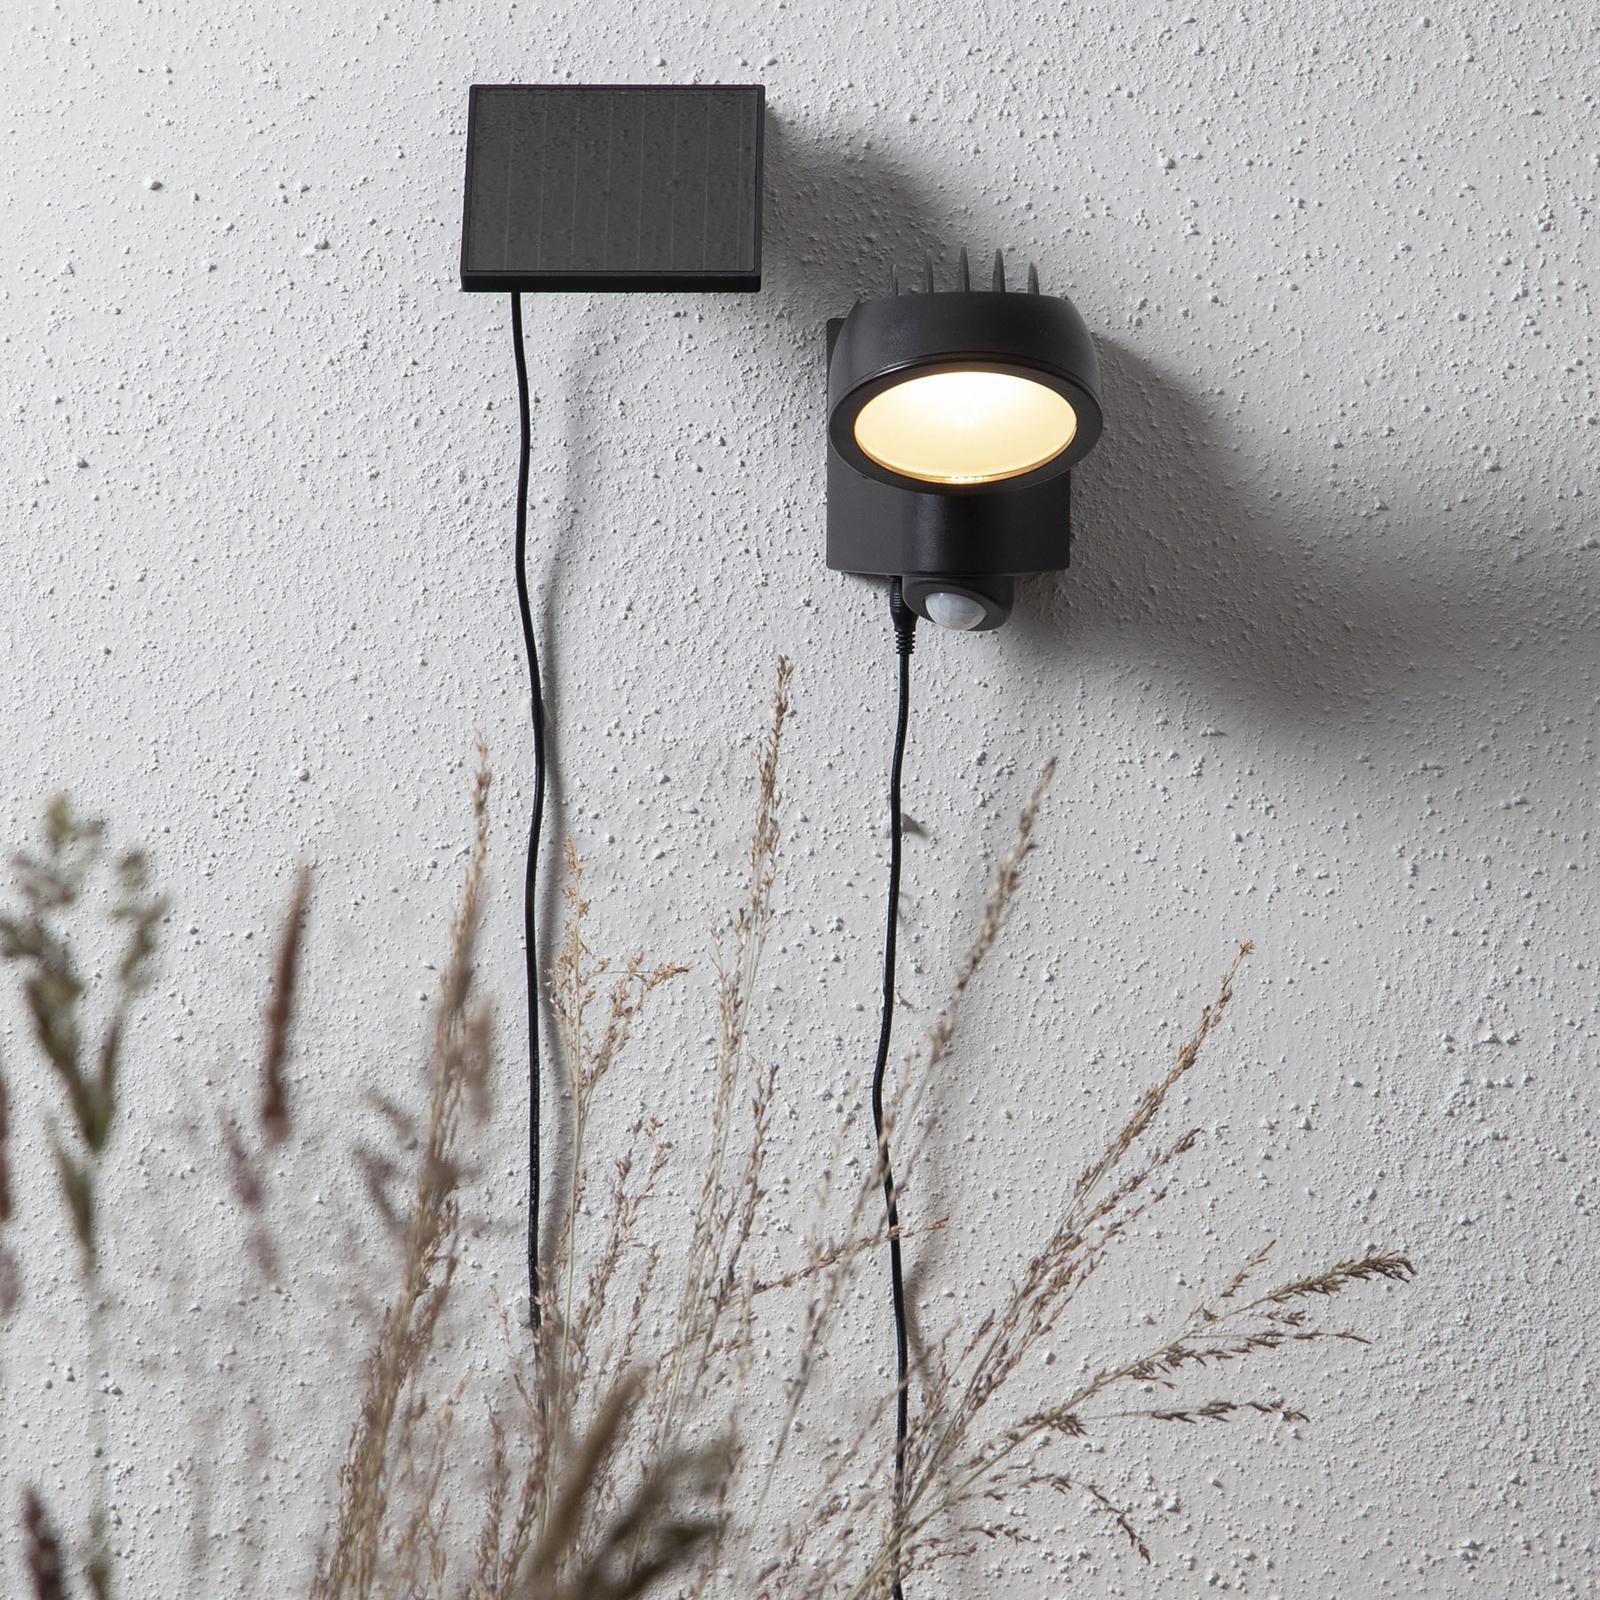 LED-solcellelampe Powerspot Senosr, rund, 150 lm